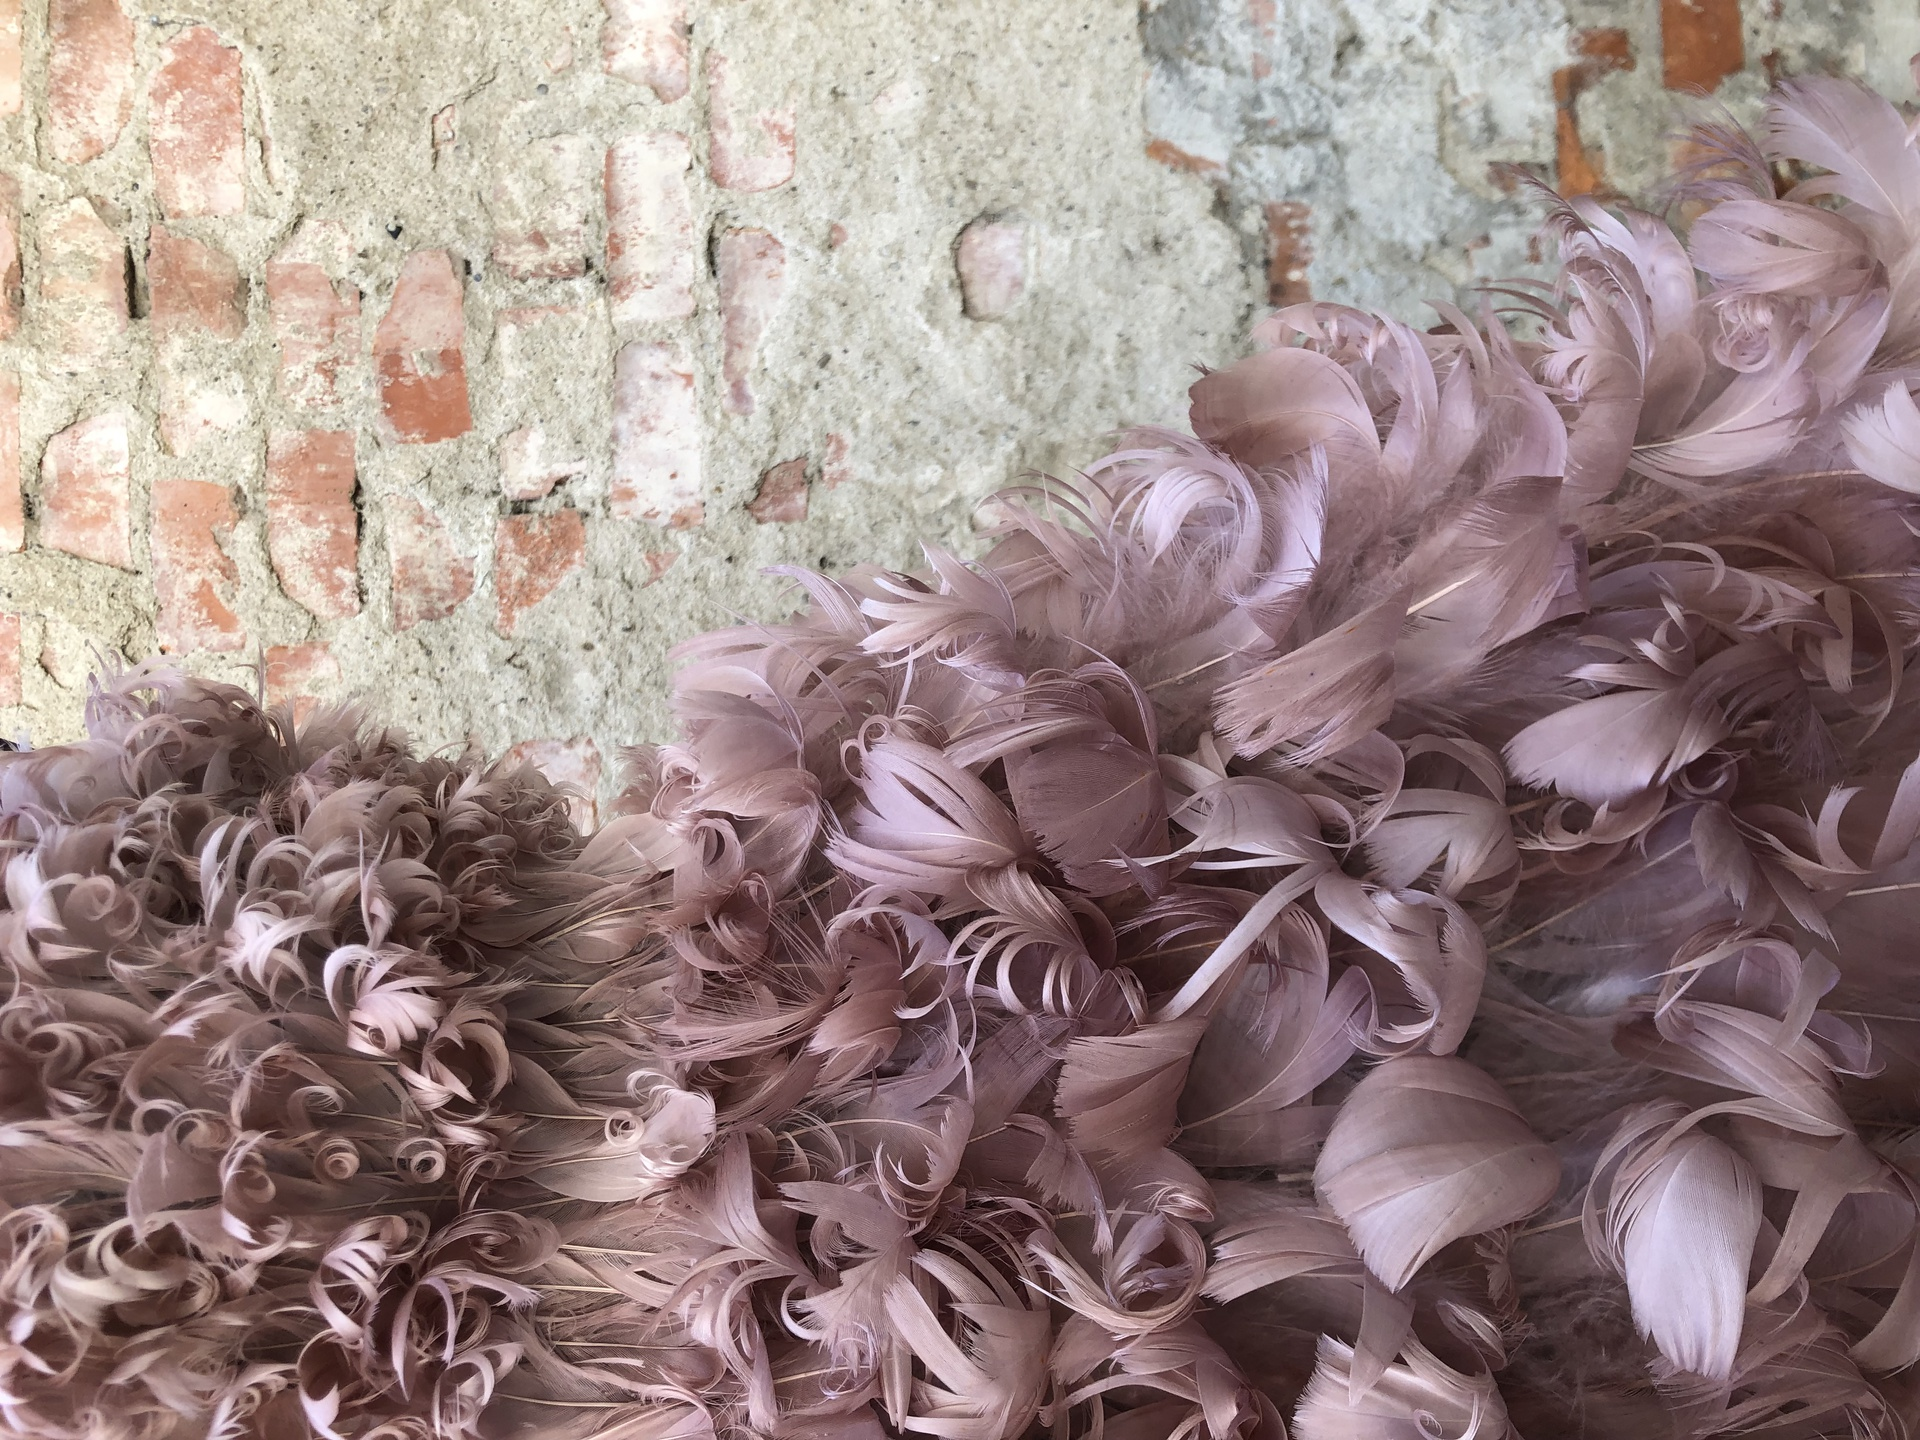 mazzanti-piume-feather-ornament-makers-firenze-thumbnail